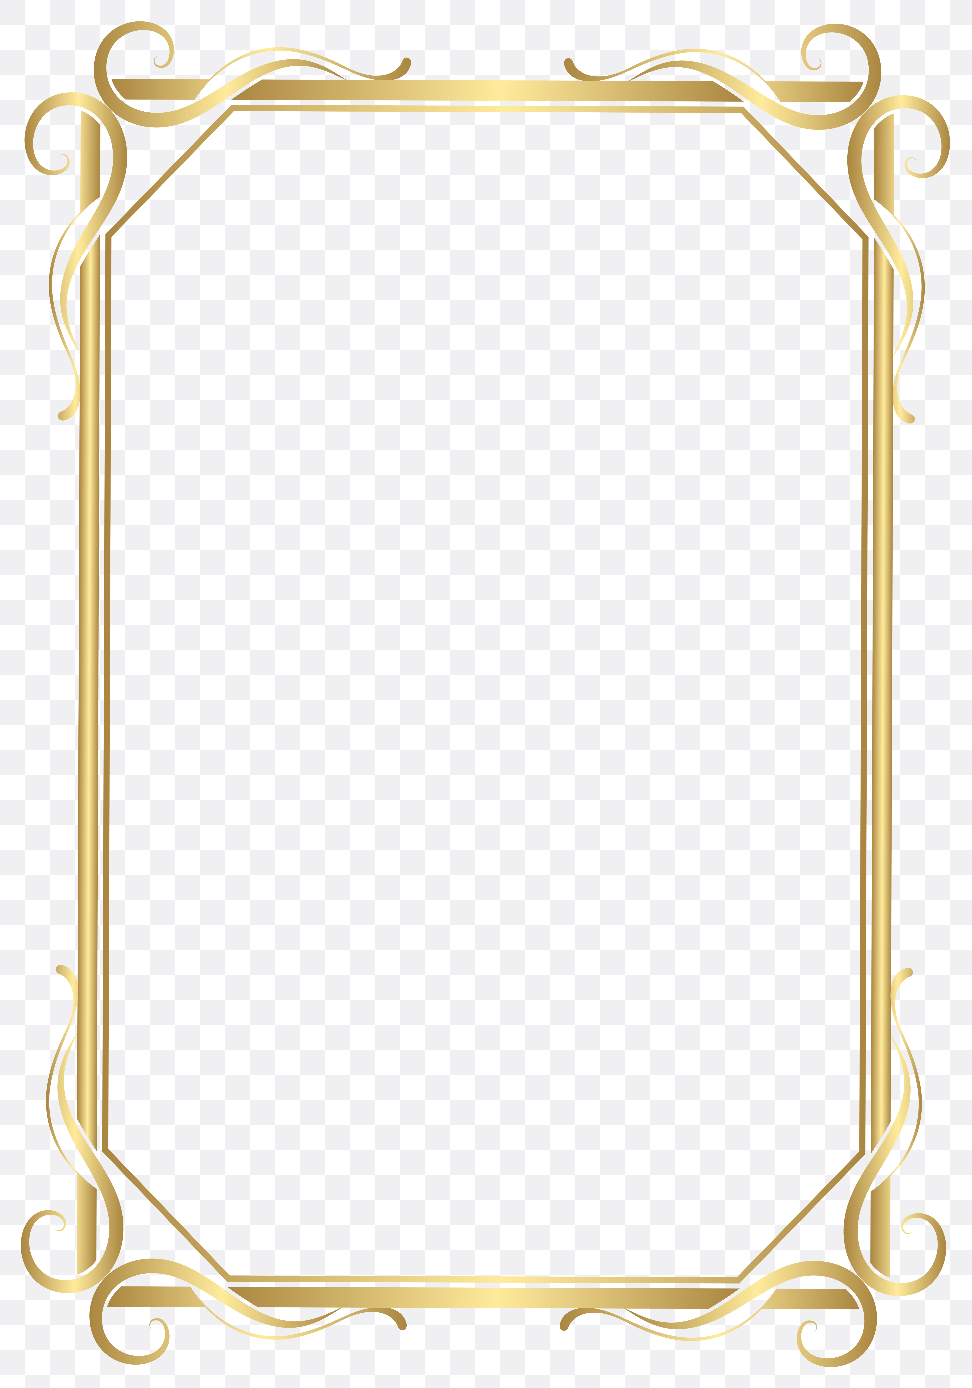 golden frame design